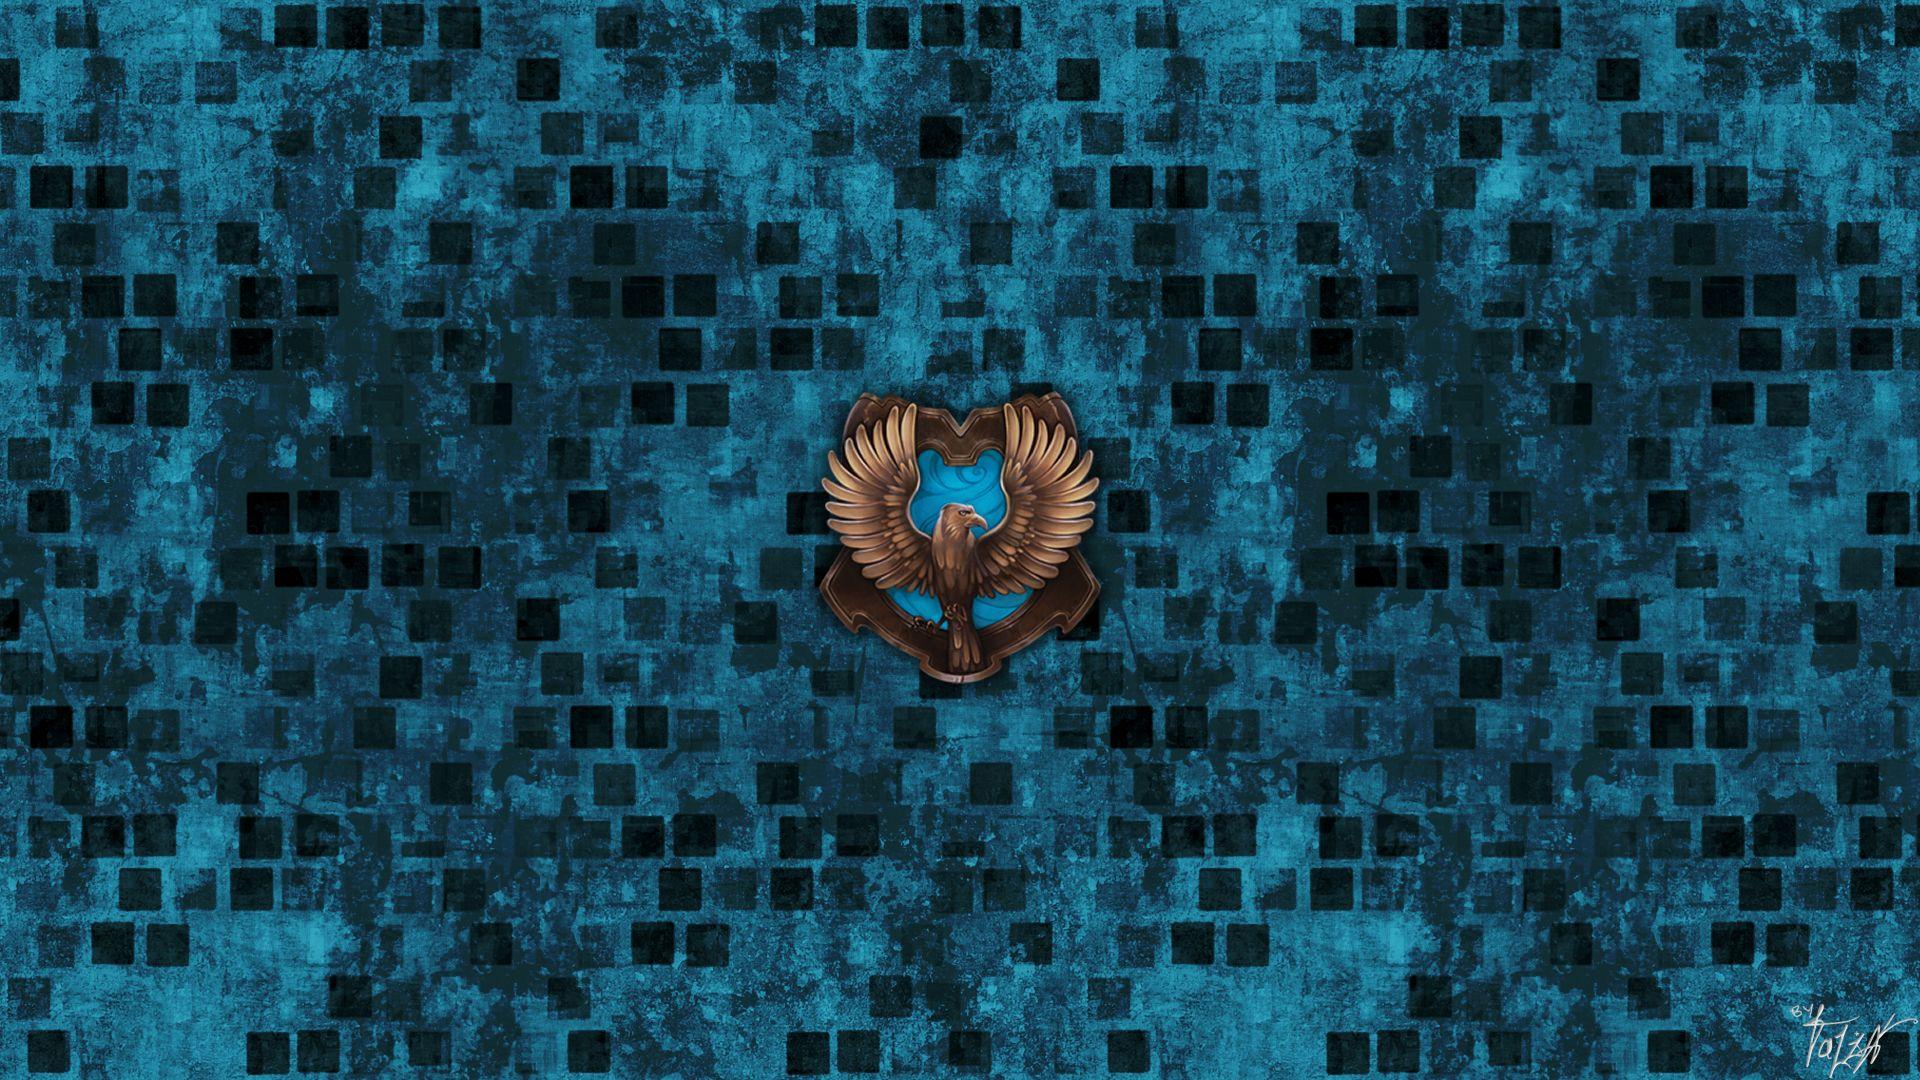 Ravenclaw brick background Ravenclaw Fink